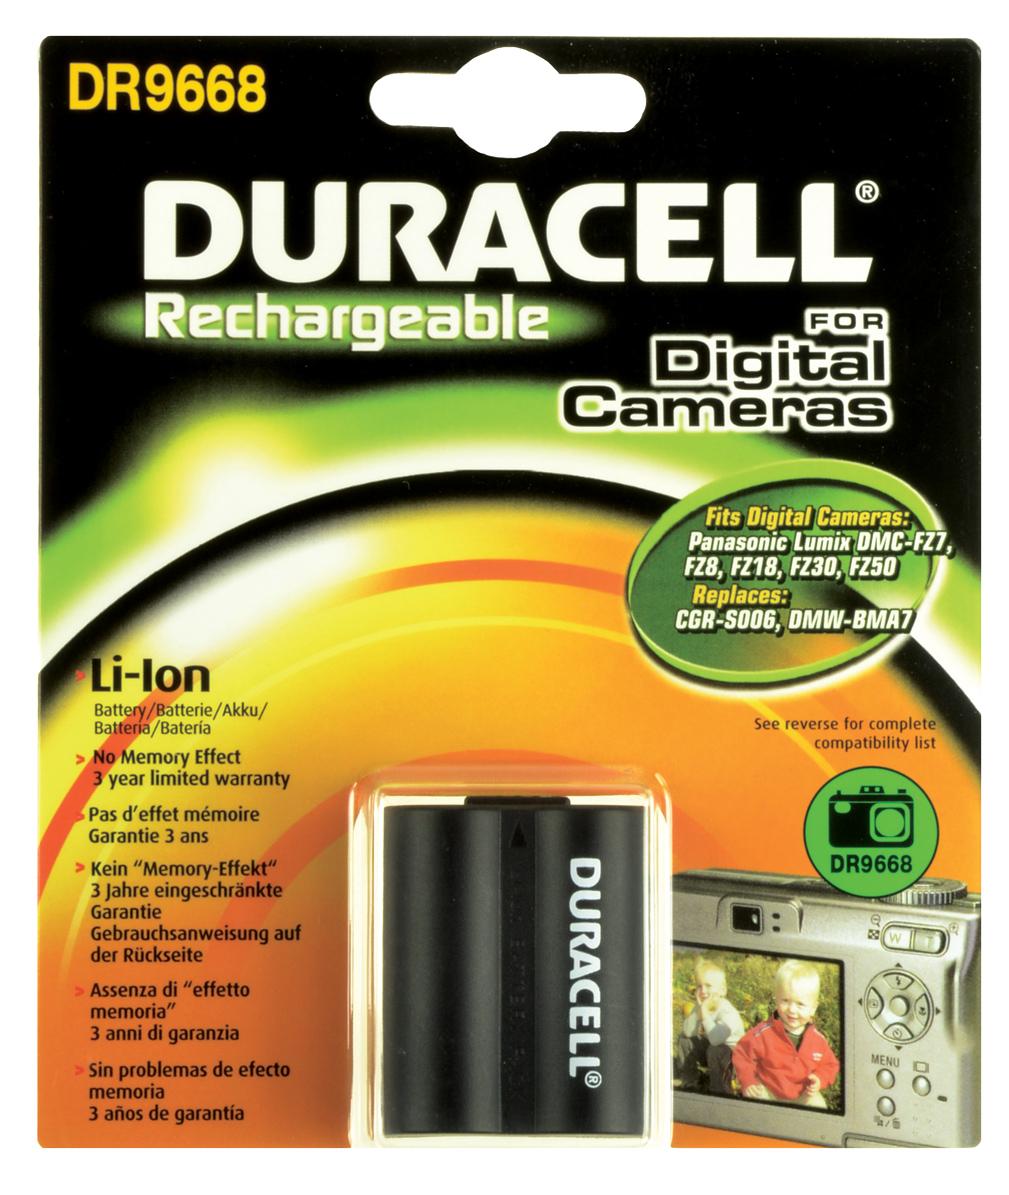 Baterie do fotoaparátu Panasonic Lumix DMC-FZ18K/Lumix DMC-FZ18S/Lumix DMC-FZ28/Lumix DMC-FZ28GK/Lumix DMC-FZ28K/Lumix DMC-FZ28S/Lumix DMC-FZ30/Lumix…